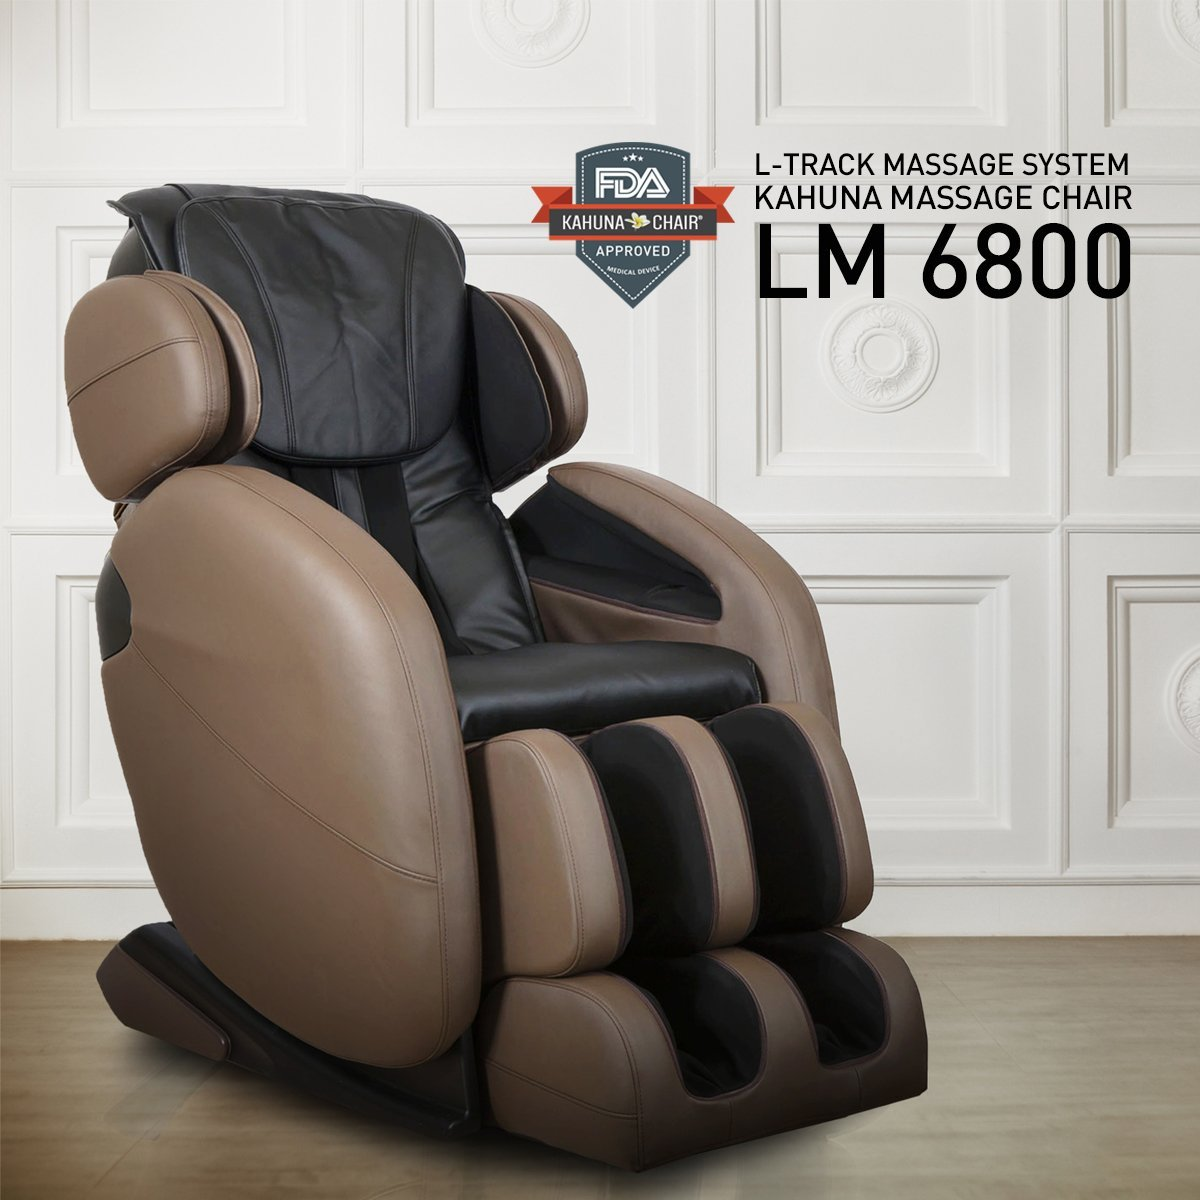 Full Body Zero Gravity Space Saving L Track Kahuna Massage Chair